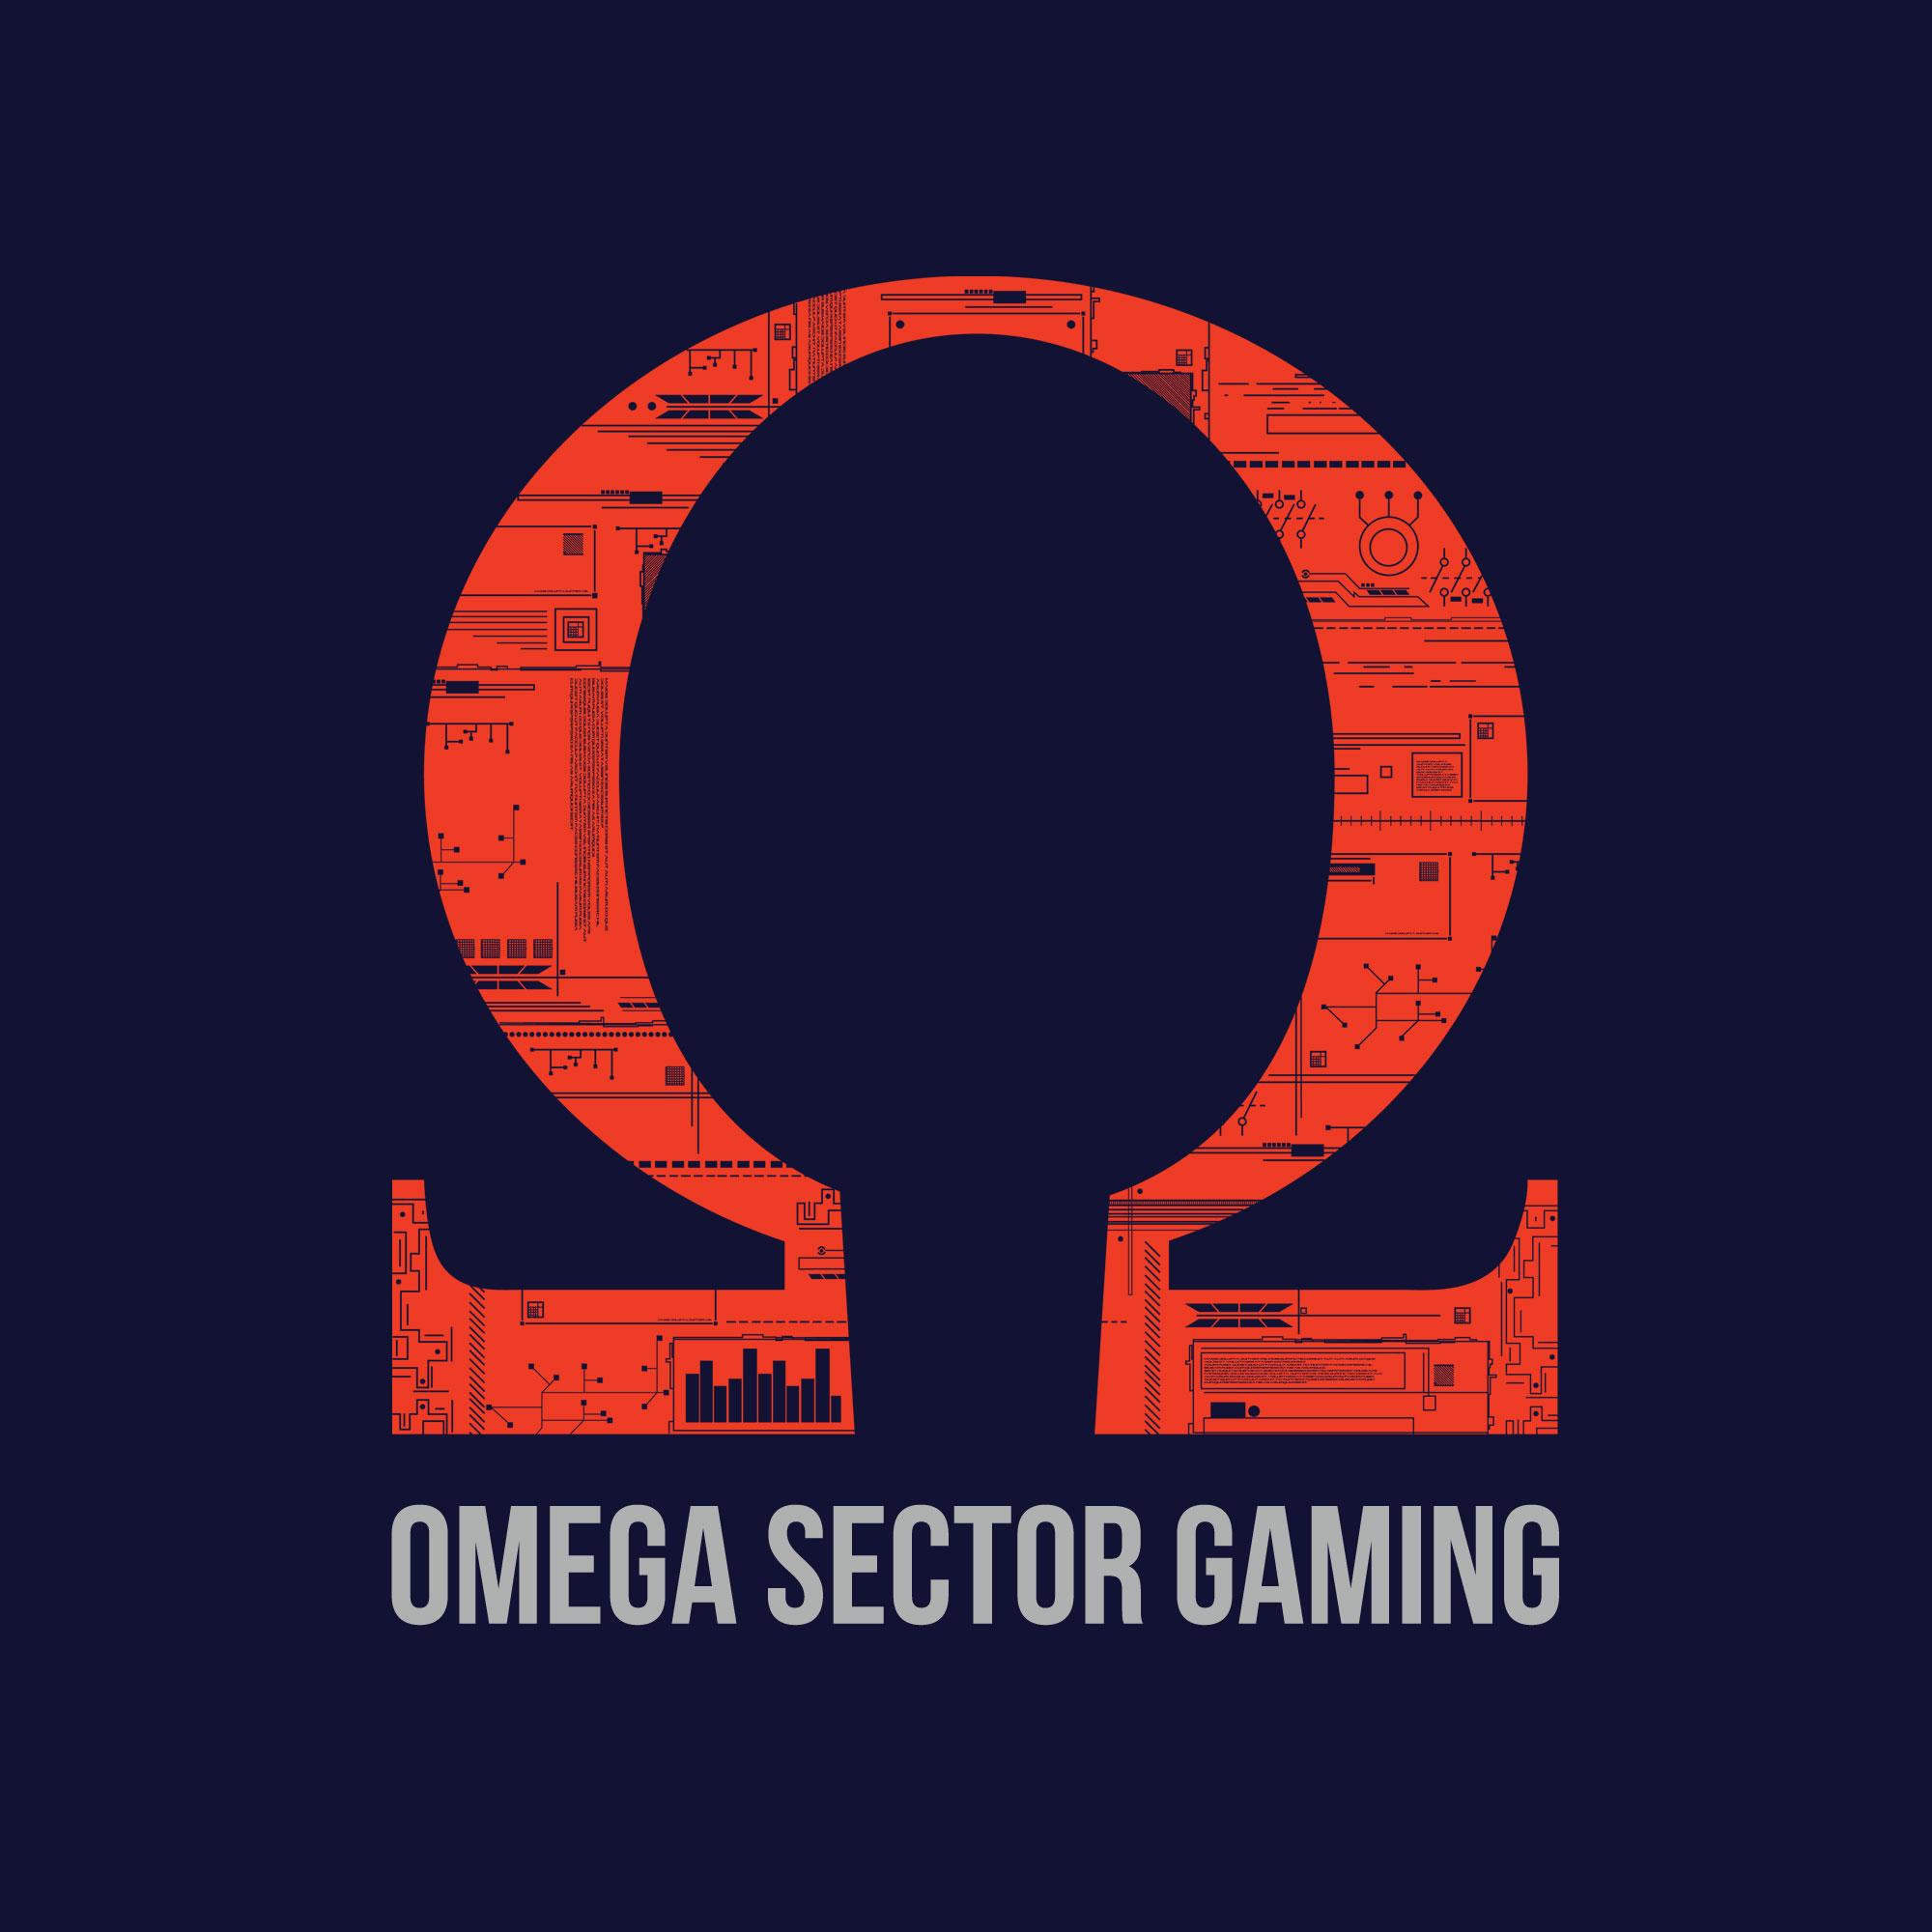 Omega sector gaming buycottarizona